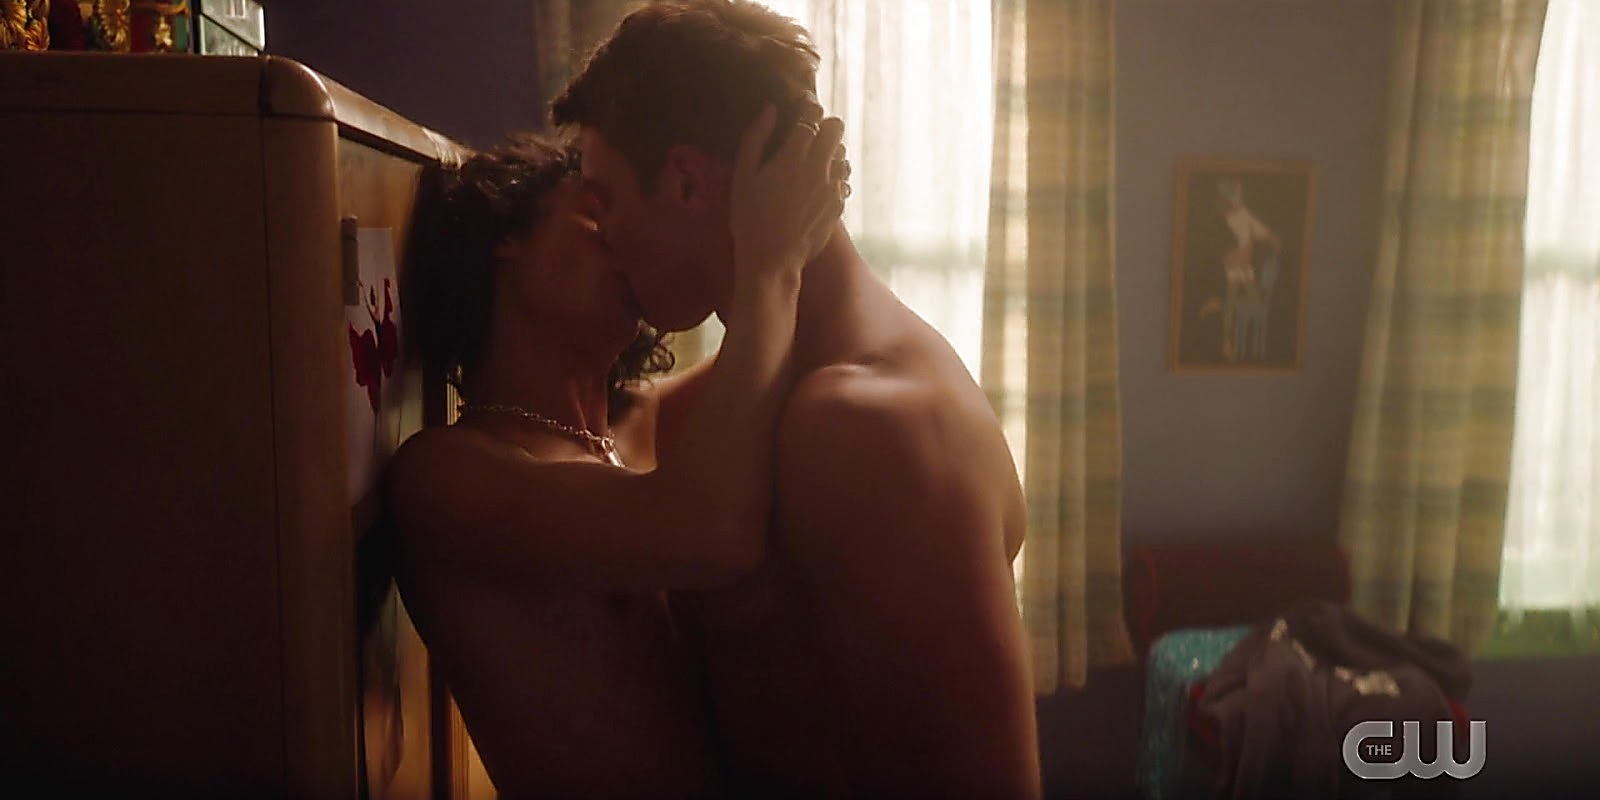 Jonny Beauchamp sexy shirtless scene February 28, 2020, 6am